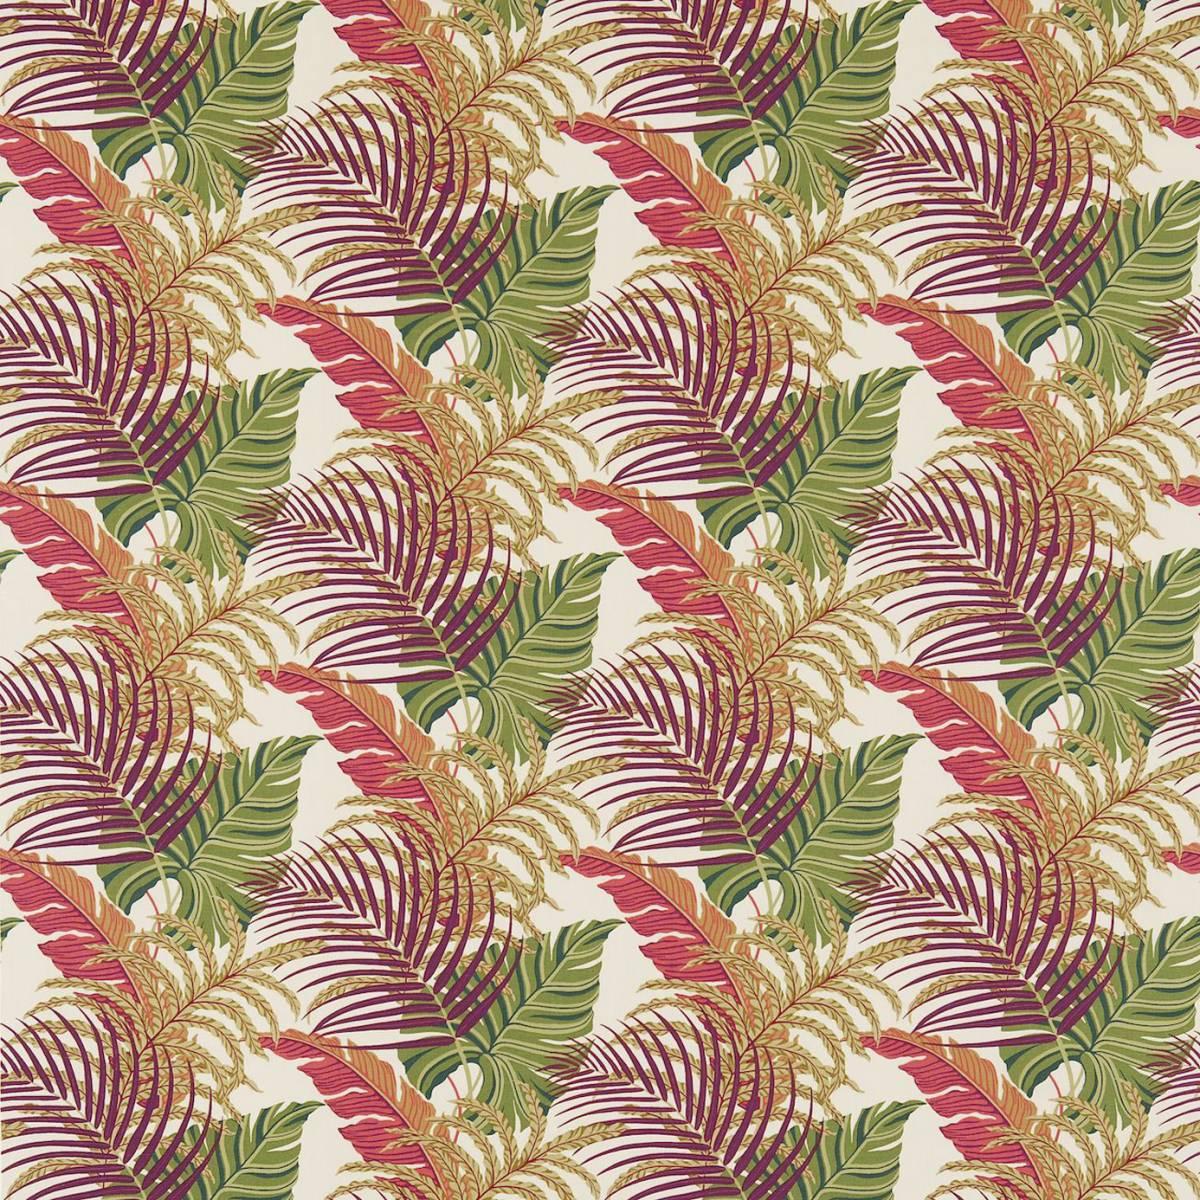 manila fabric mulberry sand 223281 sanderson voyage. Black Bedroom Furniture Sets. Home Design Ideas